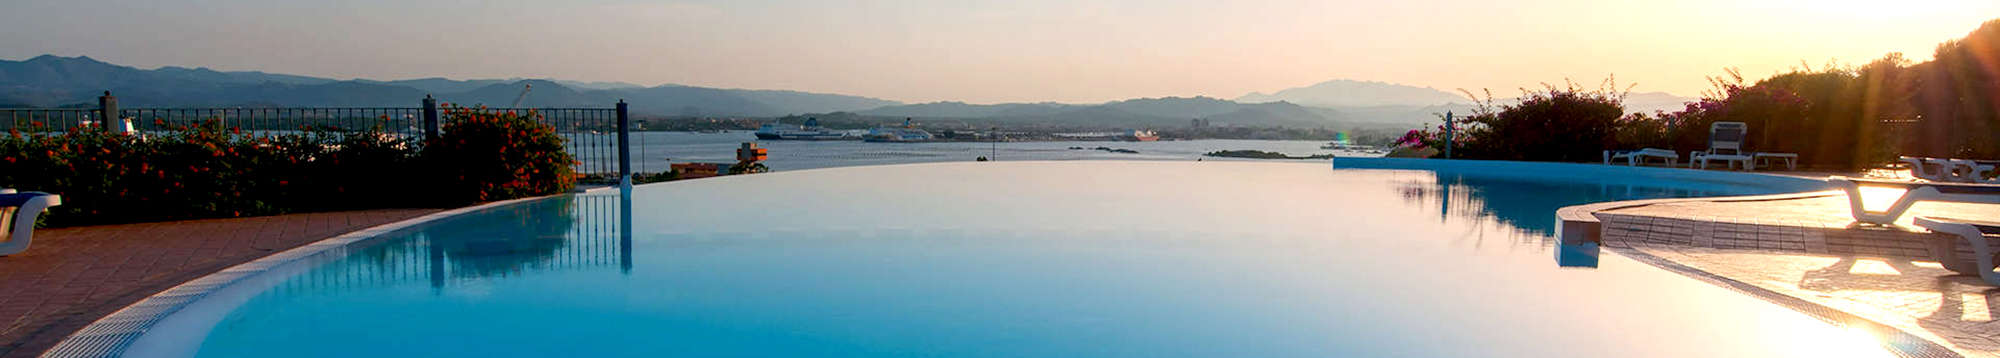 Week end e soggiorni Speciale Seatravel Sardegna - Weekendesk